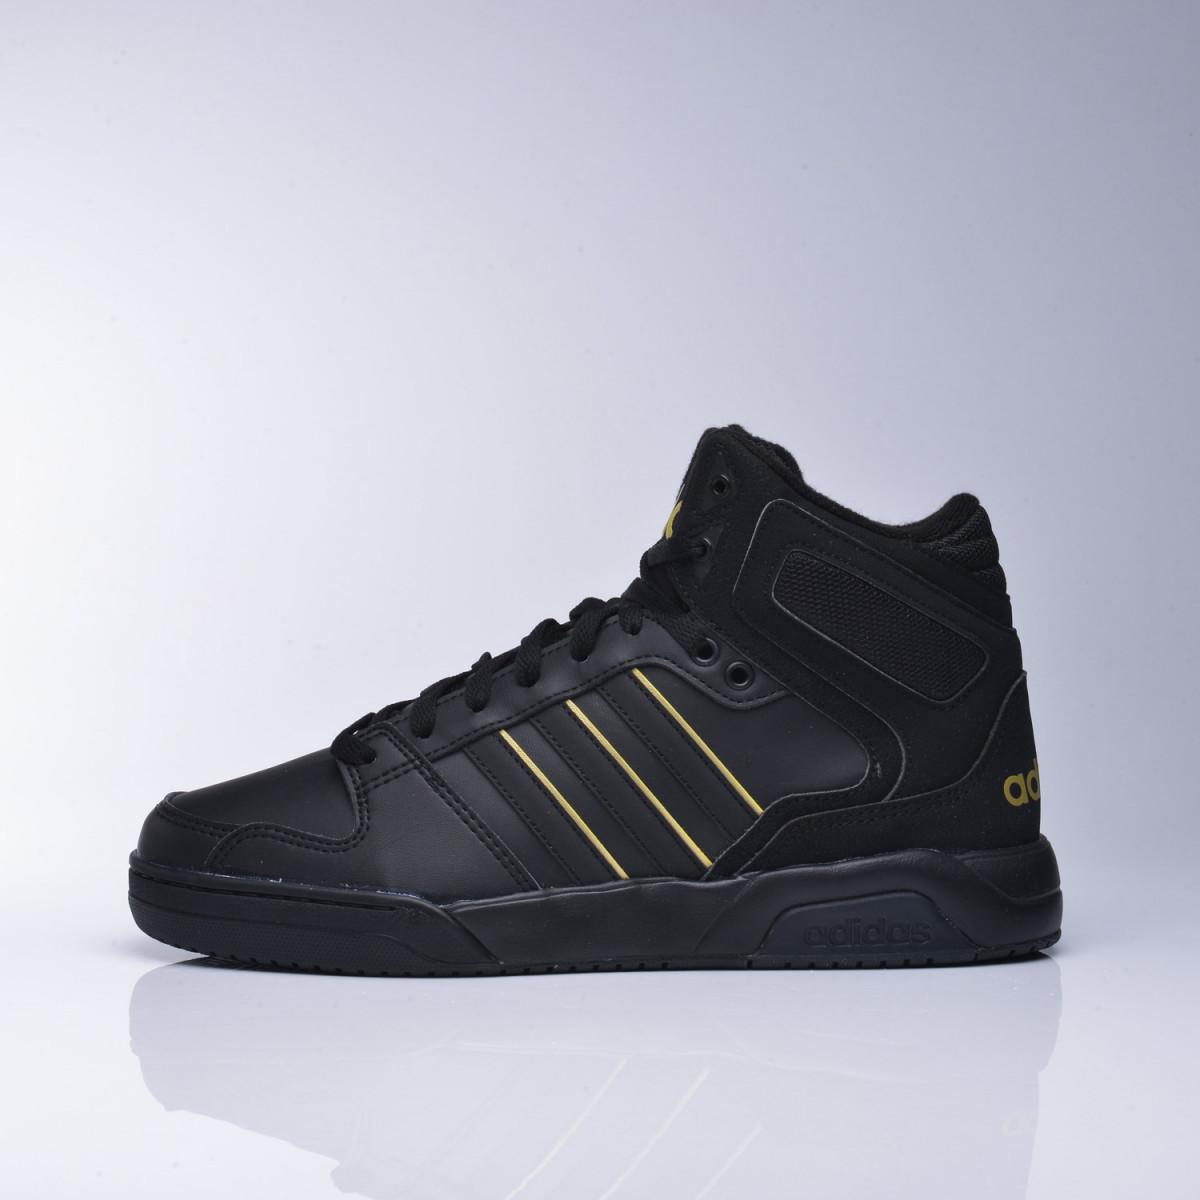 Zapatillas Adidas Neo Bb9Tis Mid